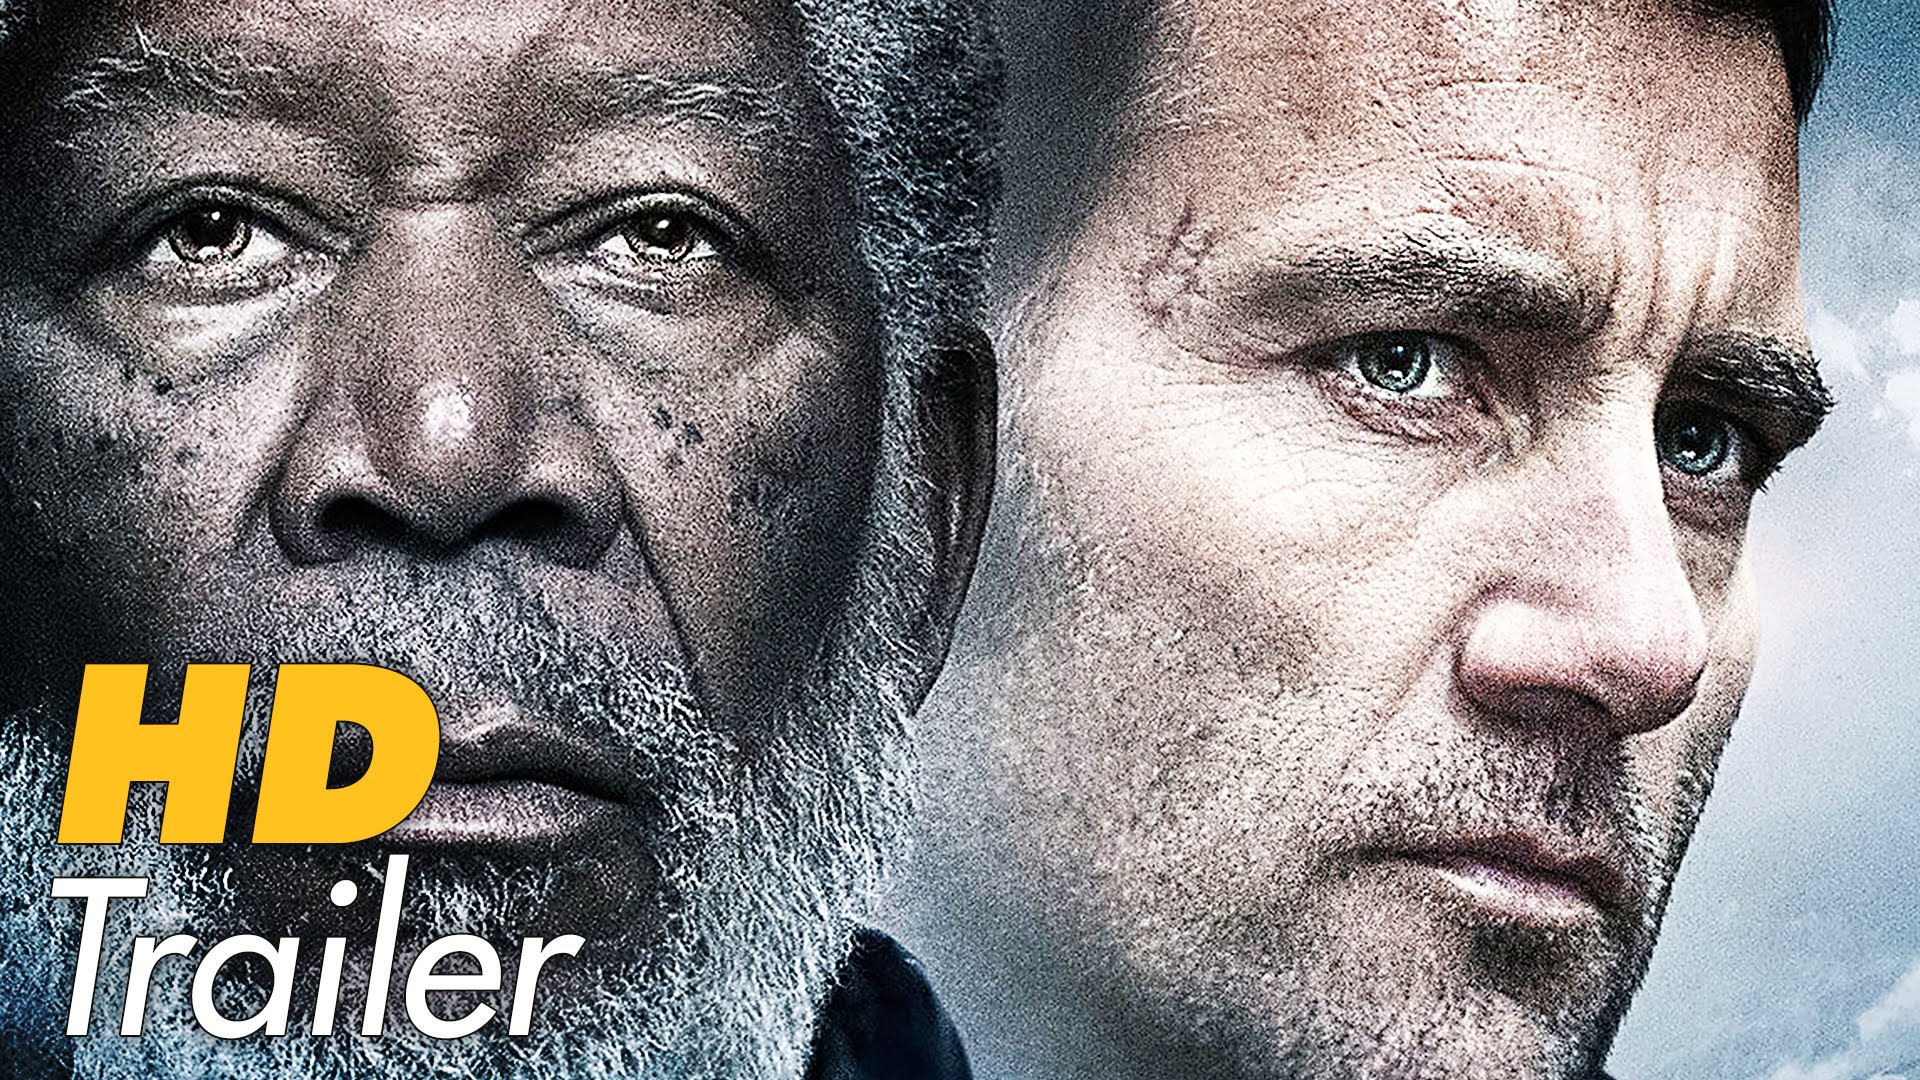 LAST KNIGHTS Trailer German Deutsch (2015) Morgan Freeman, Clive Owen